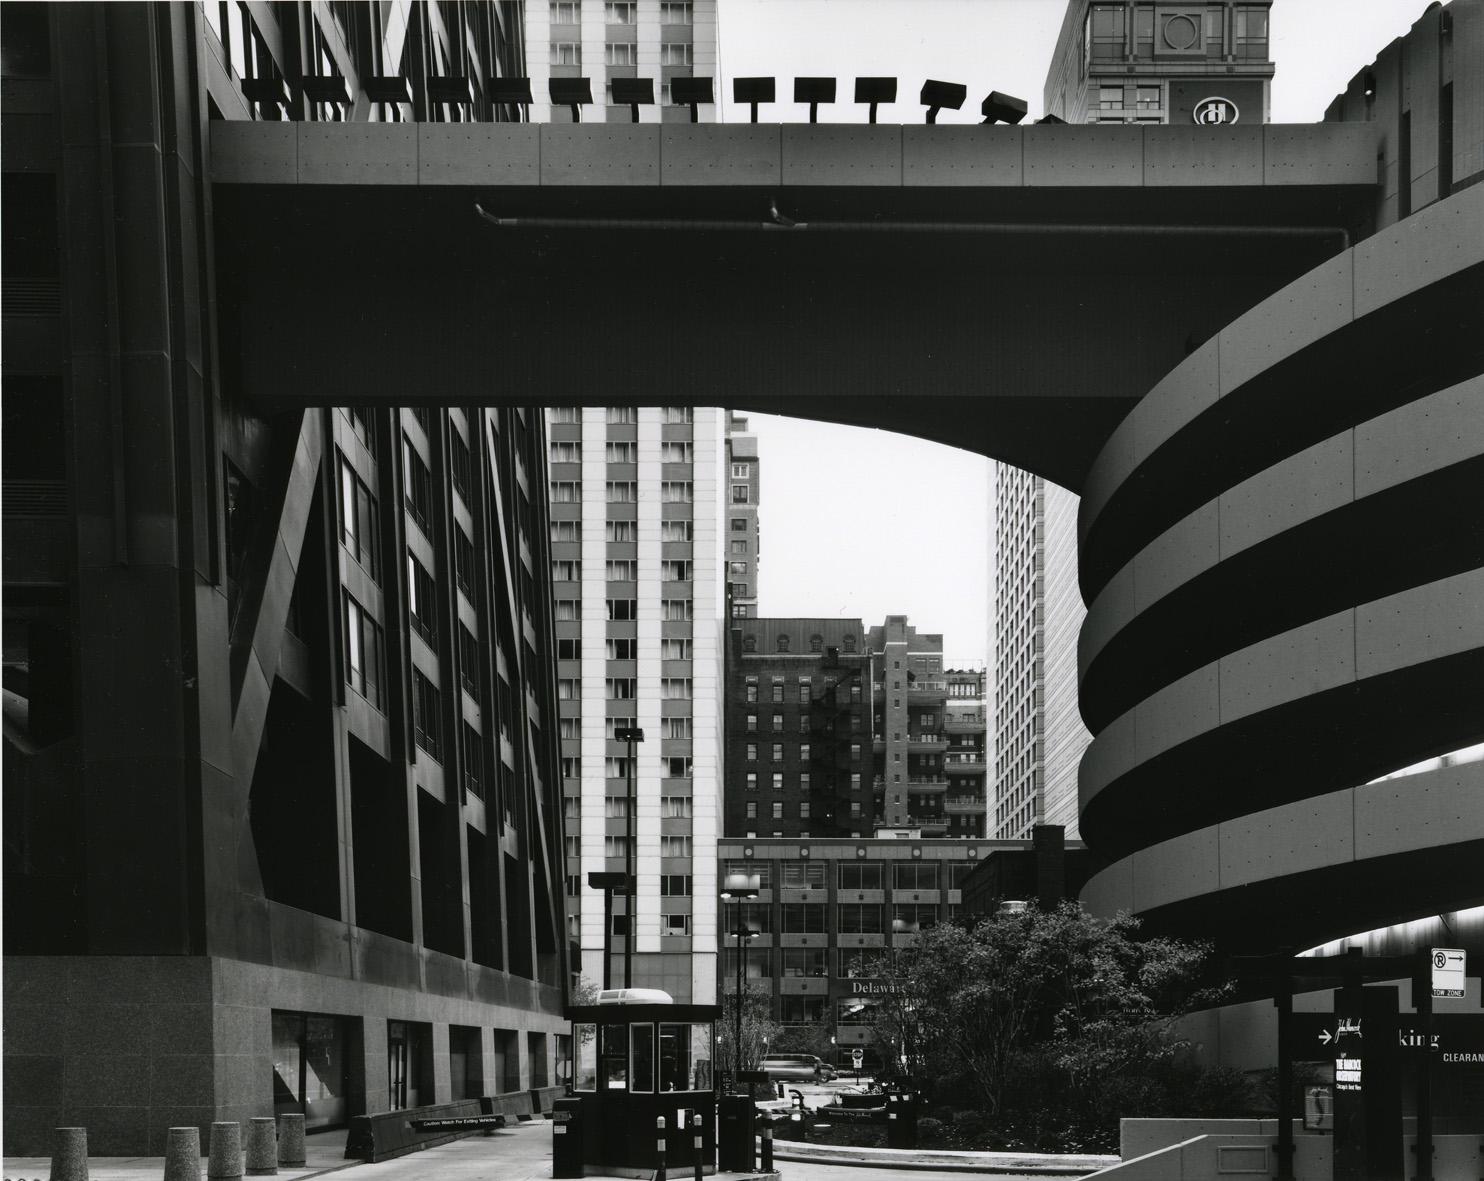 """John Hancock Building,"" 2006, photograph, 20x24 in."